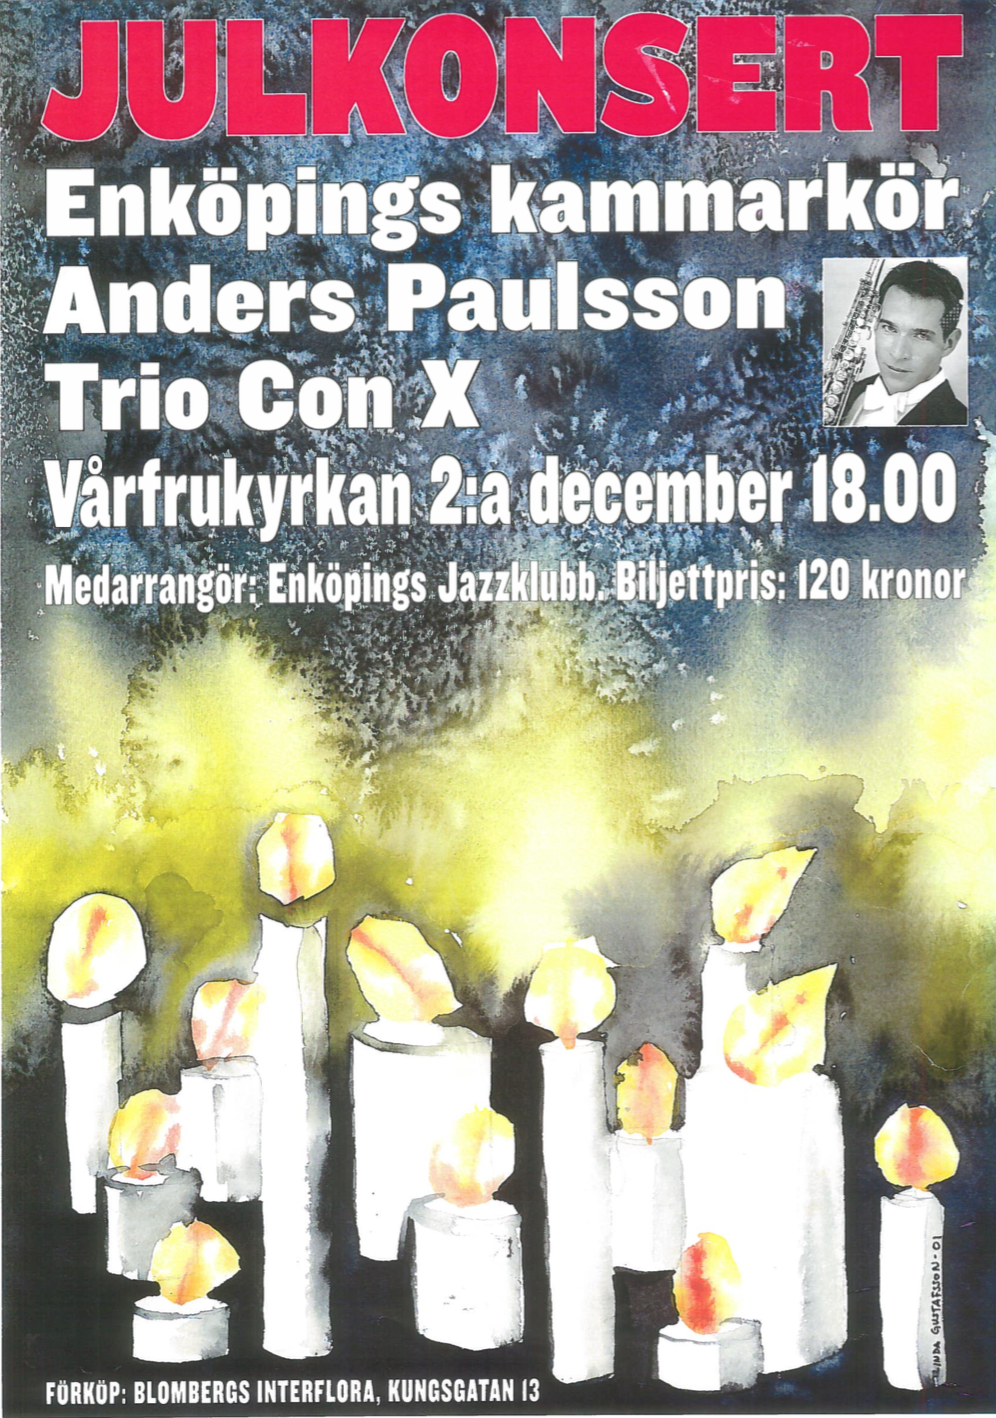 2001-affisch-julkonsert-med-enkopings-kammarkor